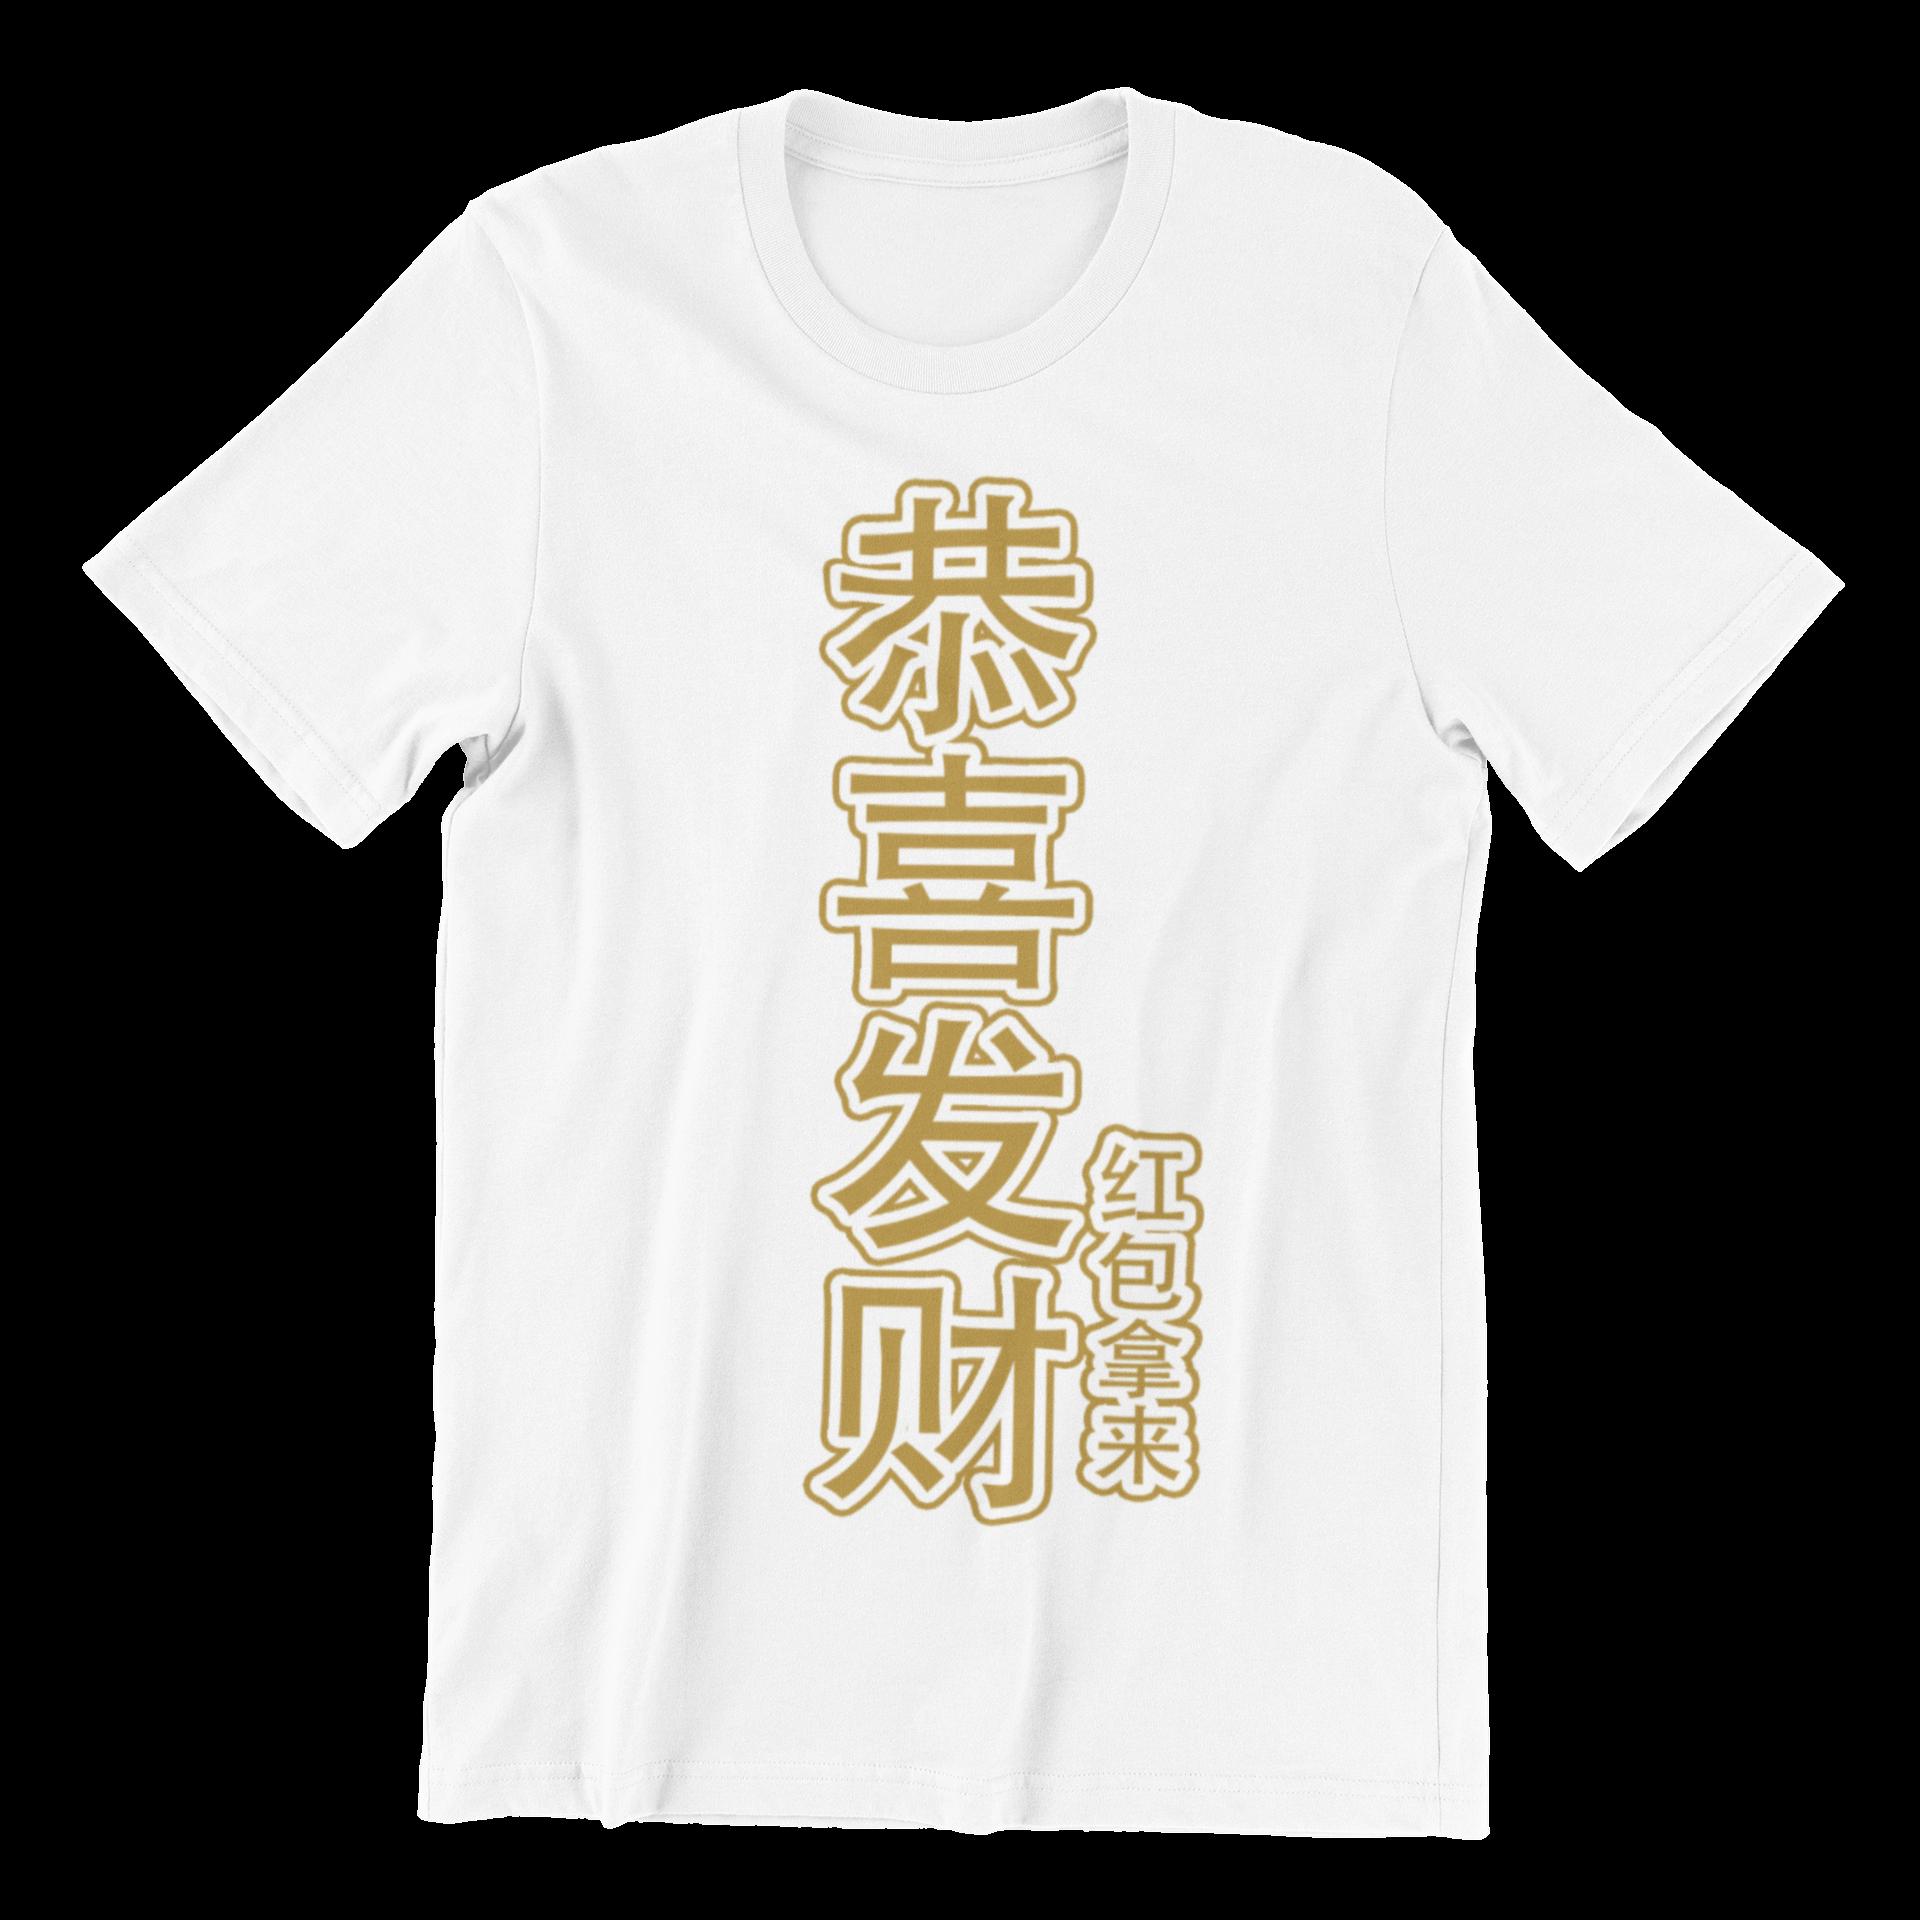 (Limited Gold Edition) 恭喜发财红包拿来 Gong Xi Fa Cai, Hong Pao Na Lai Kids Crew Neck S-Sleeve T-shirt